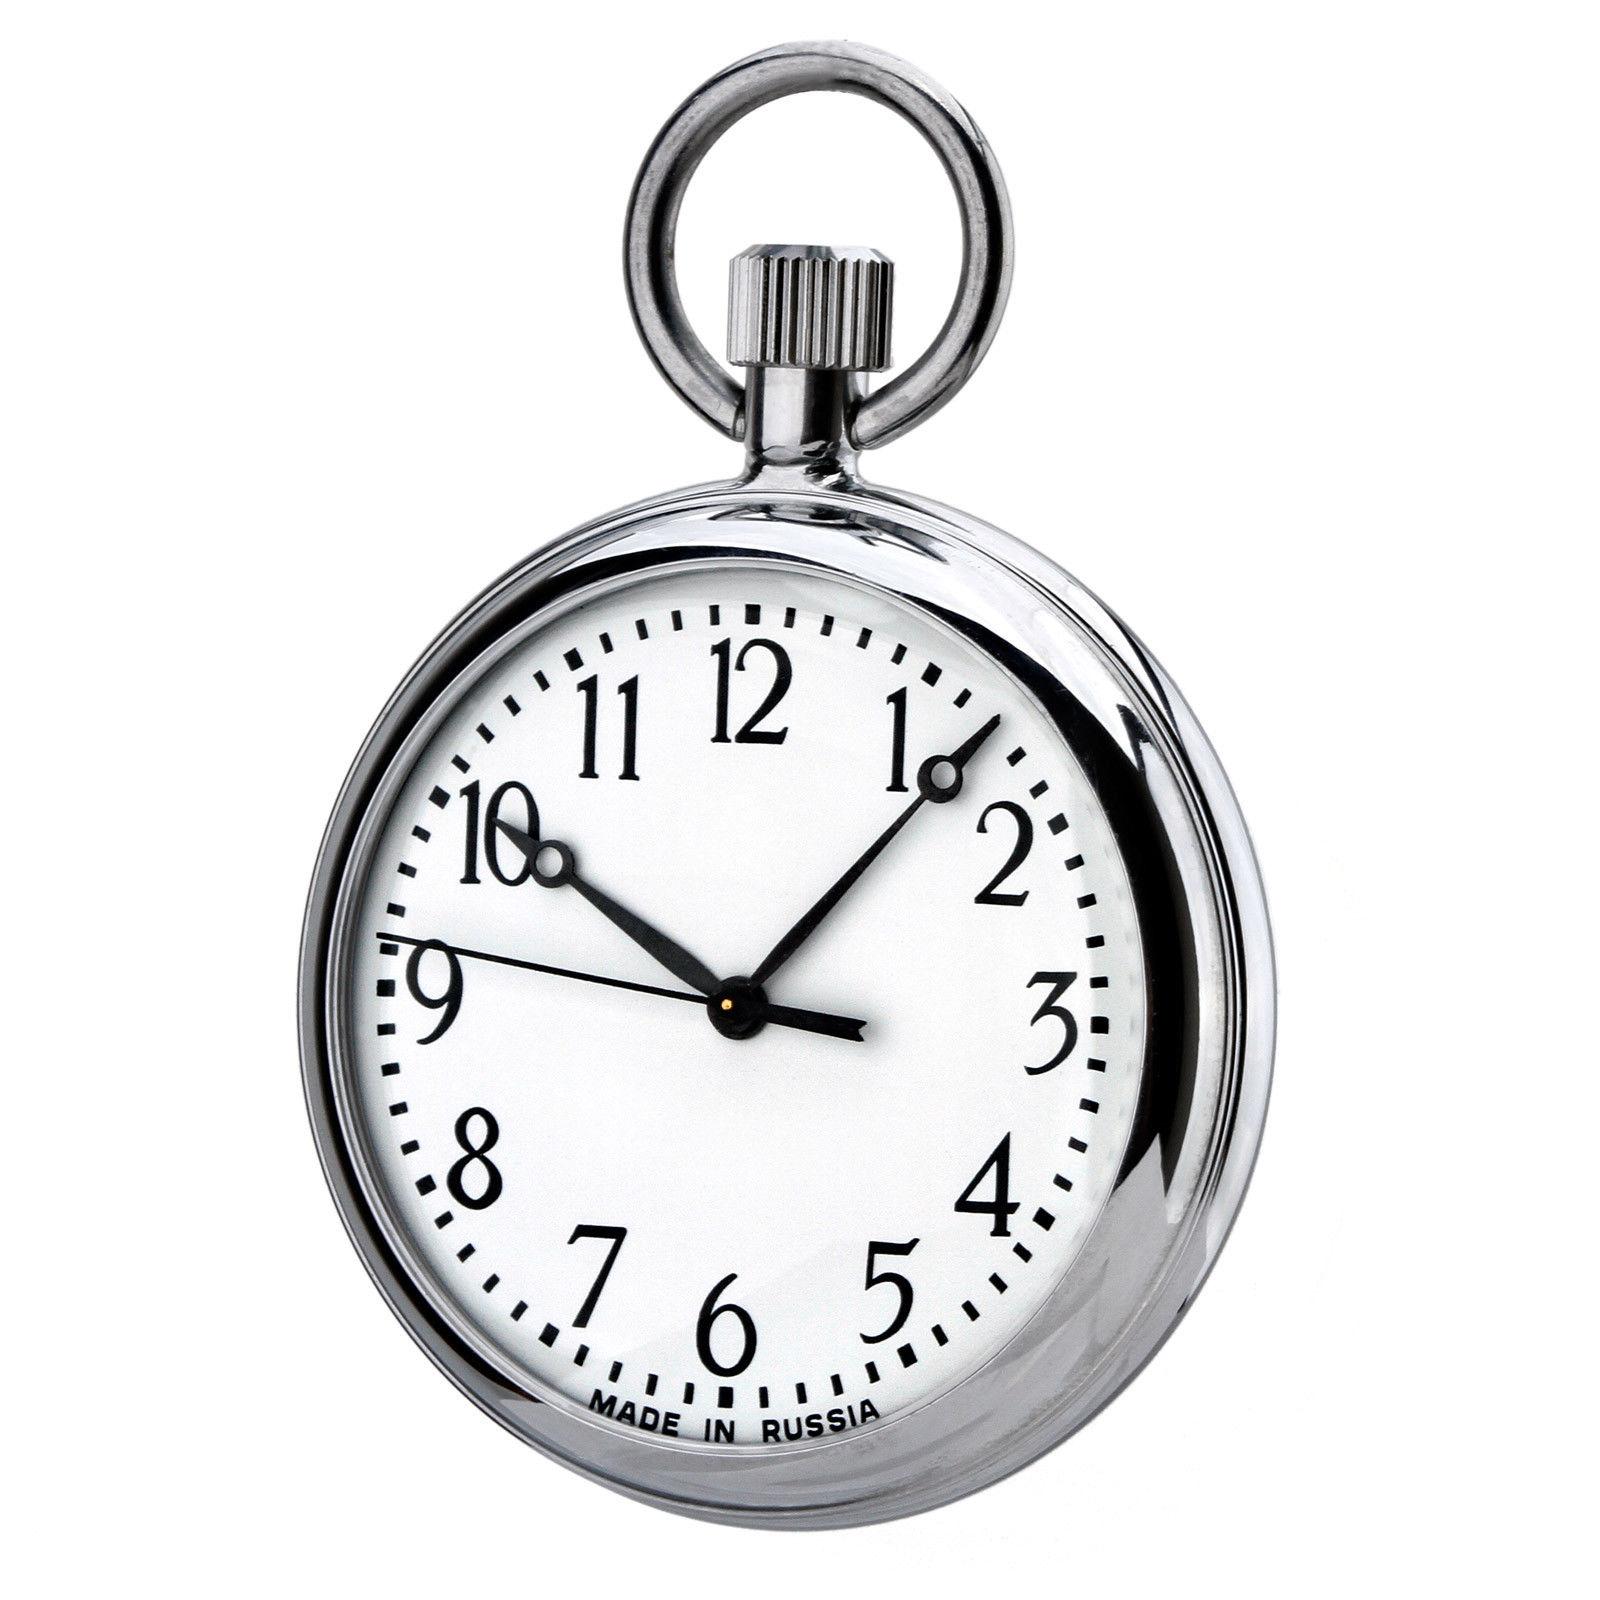 1600x1600 Molnija 3602 Pocket Watch Russian Sage By Ural Russian Watch Ebay